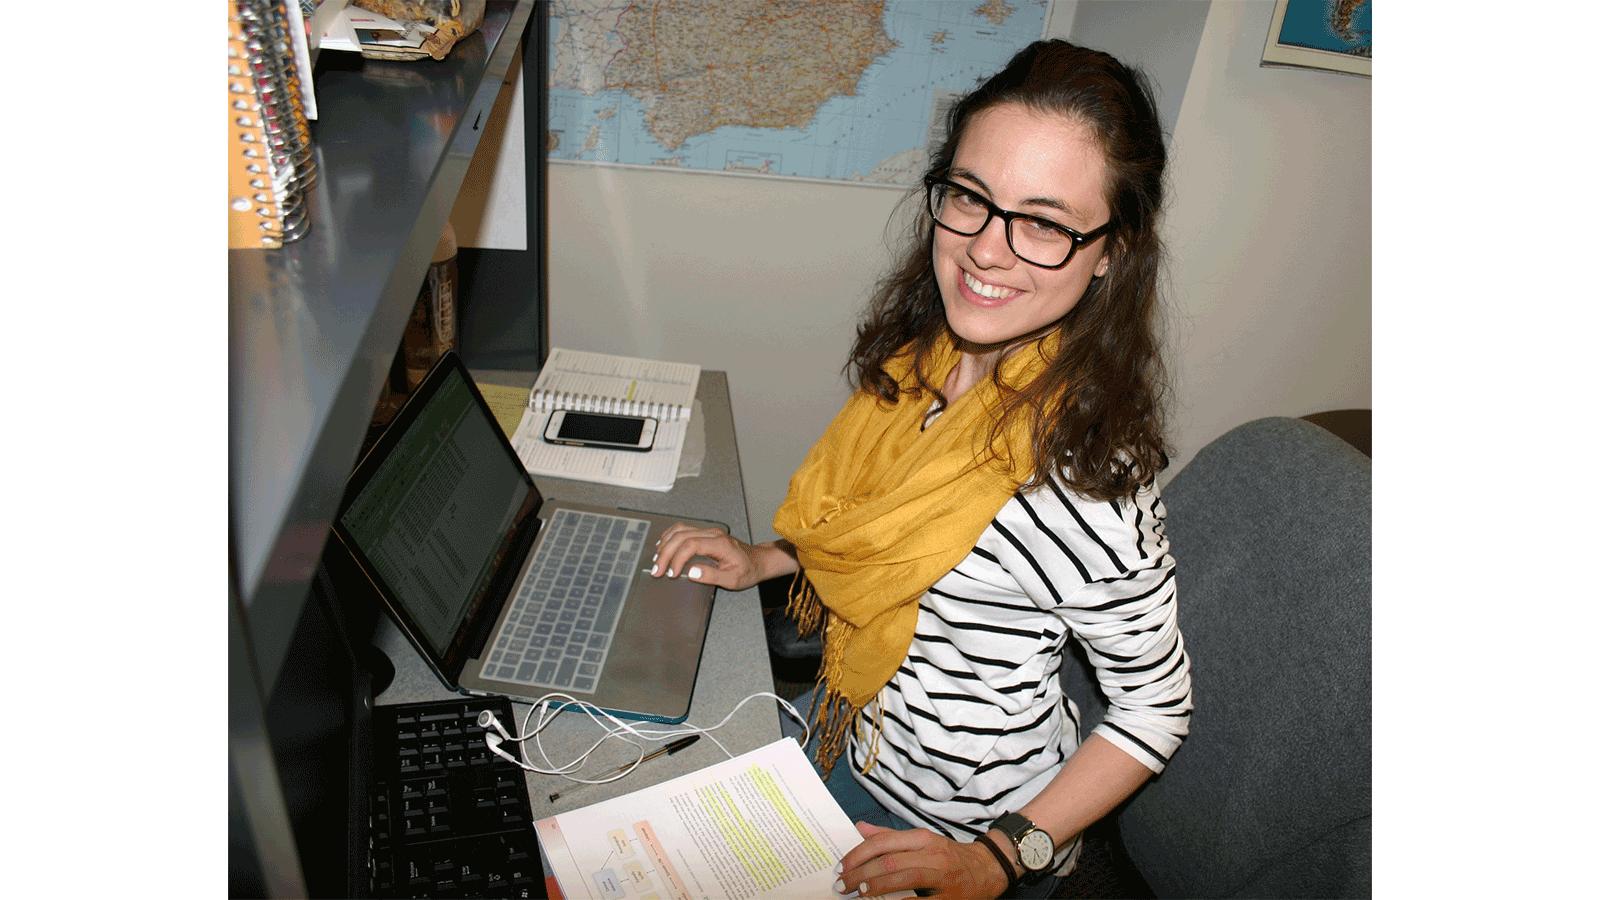 Lindsey Chandler at work